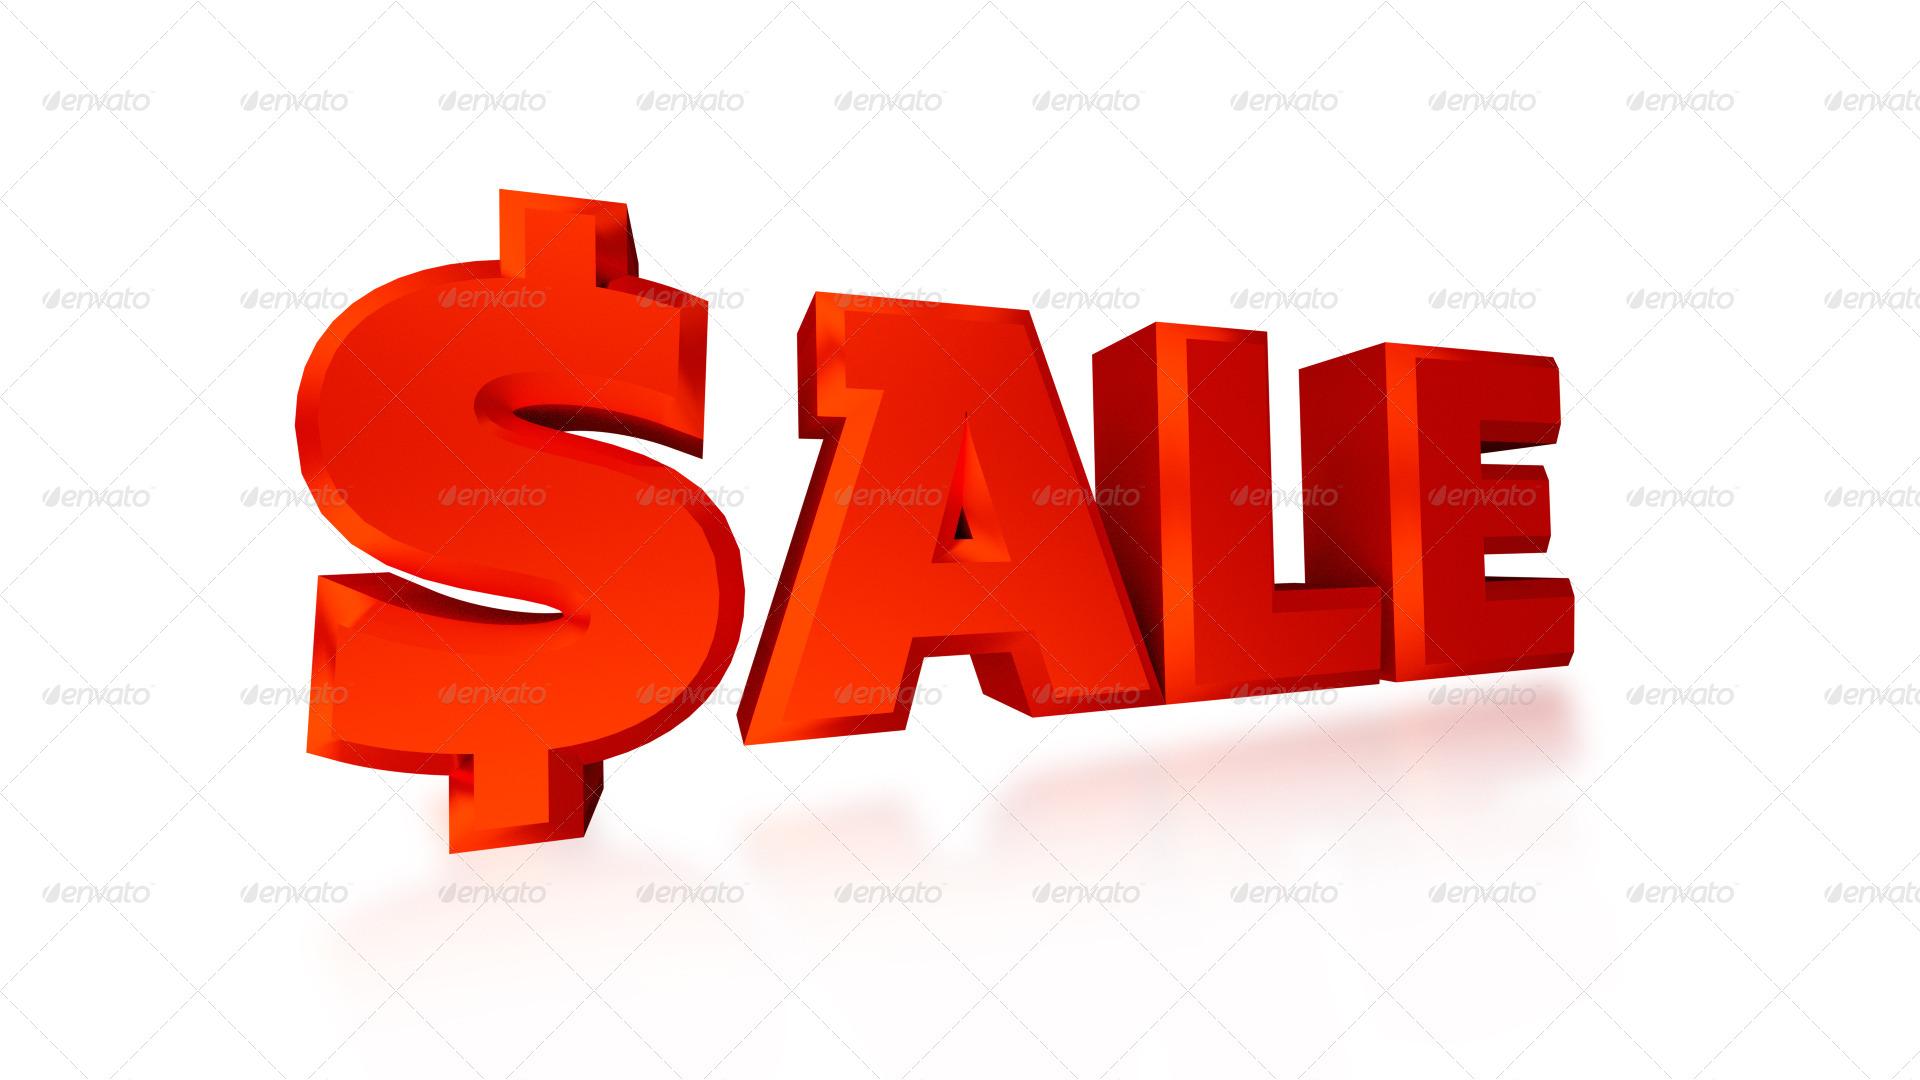 Sale.png Sale_2_Background.jpg Sale_2png.png Sale_3.png PlusPng.com  - Sale HD PNG